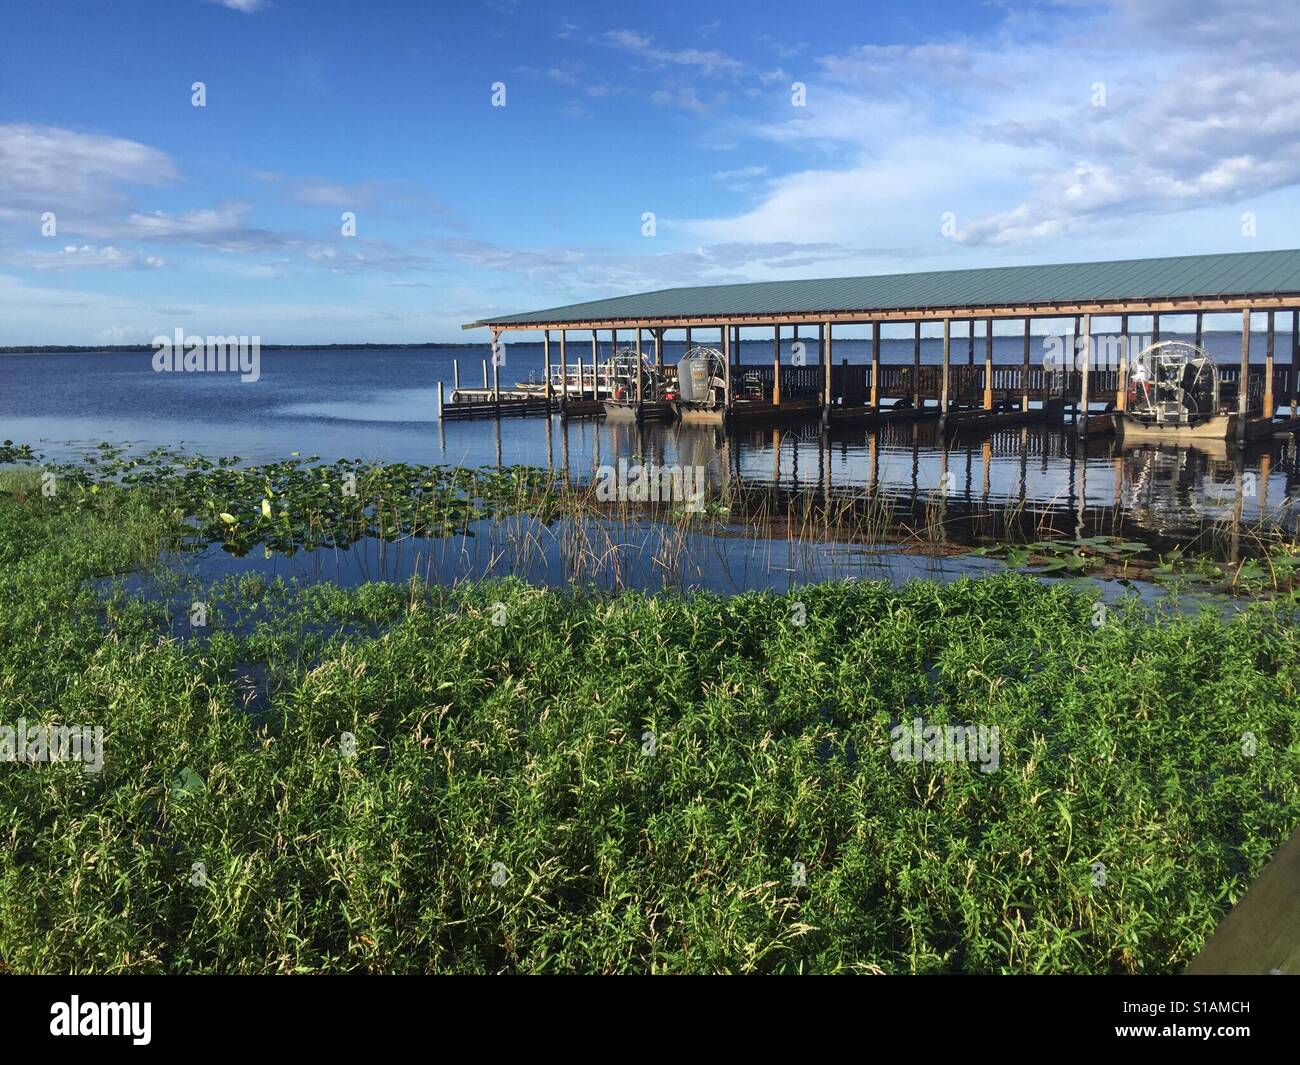 Florida Wildlife and Gator Park, Orlando - Stock Image